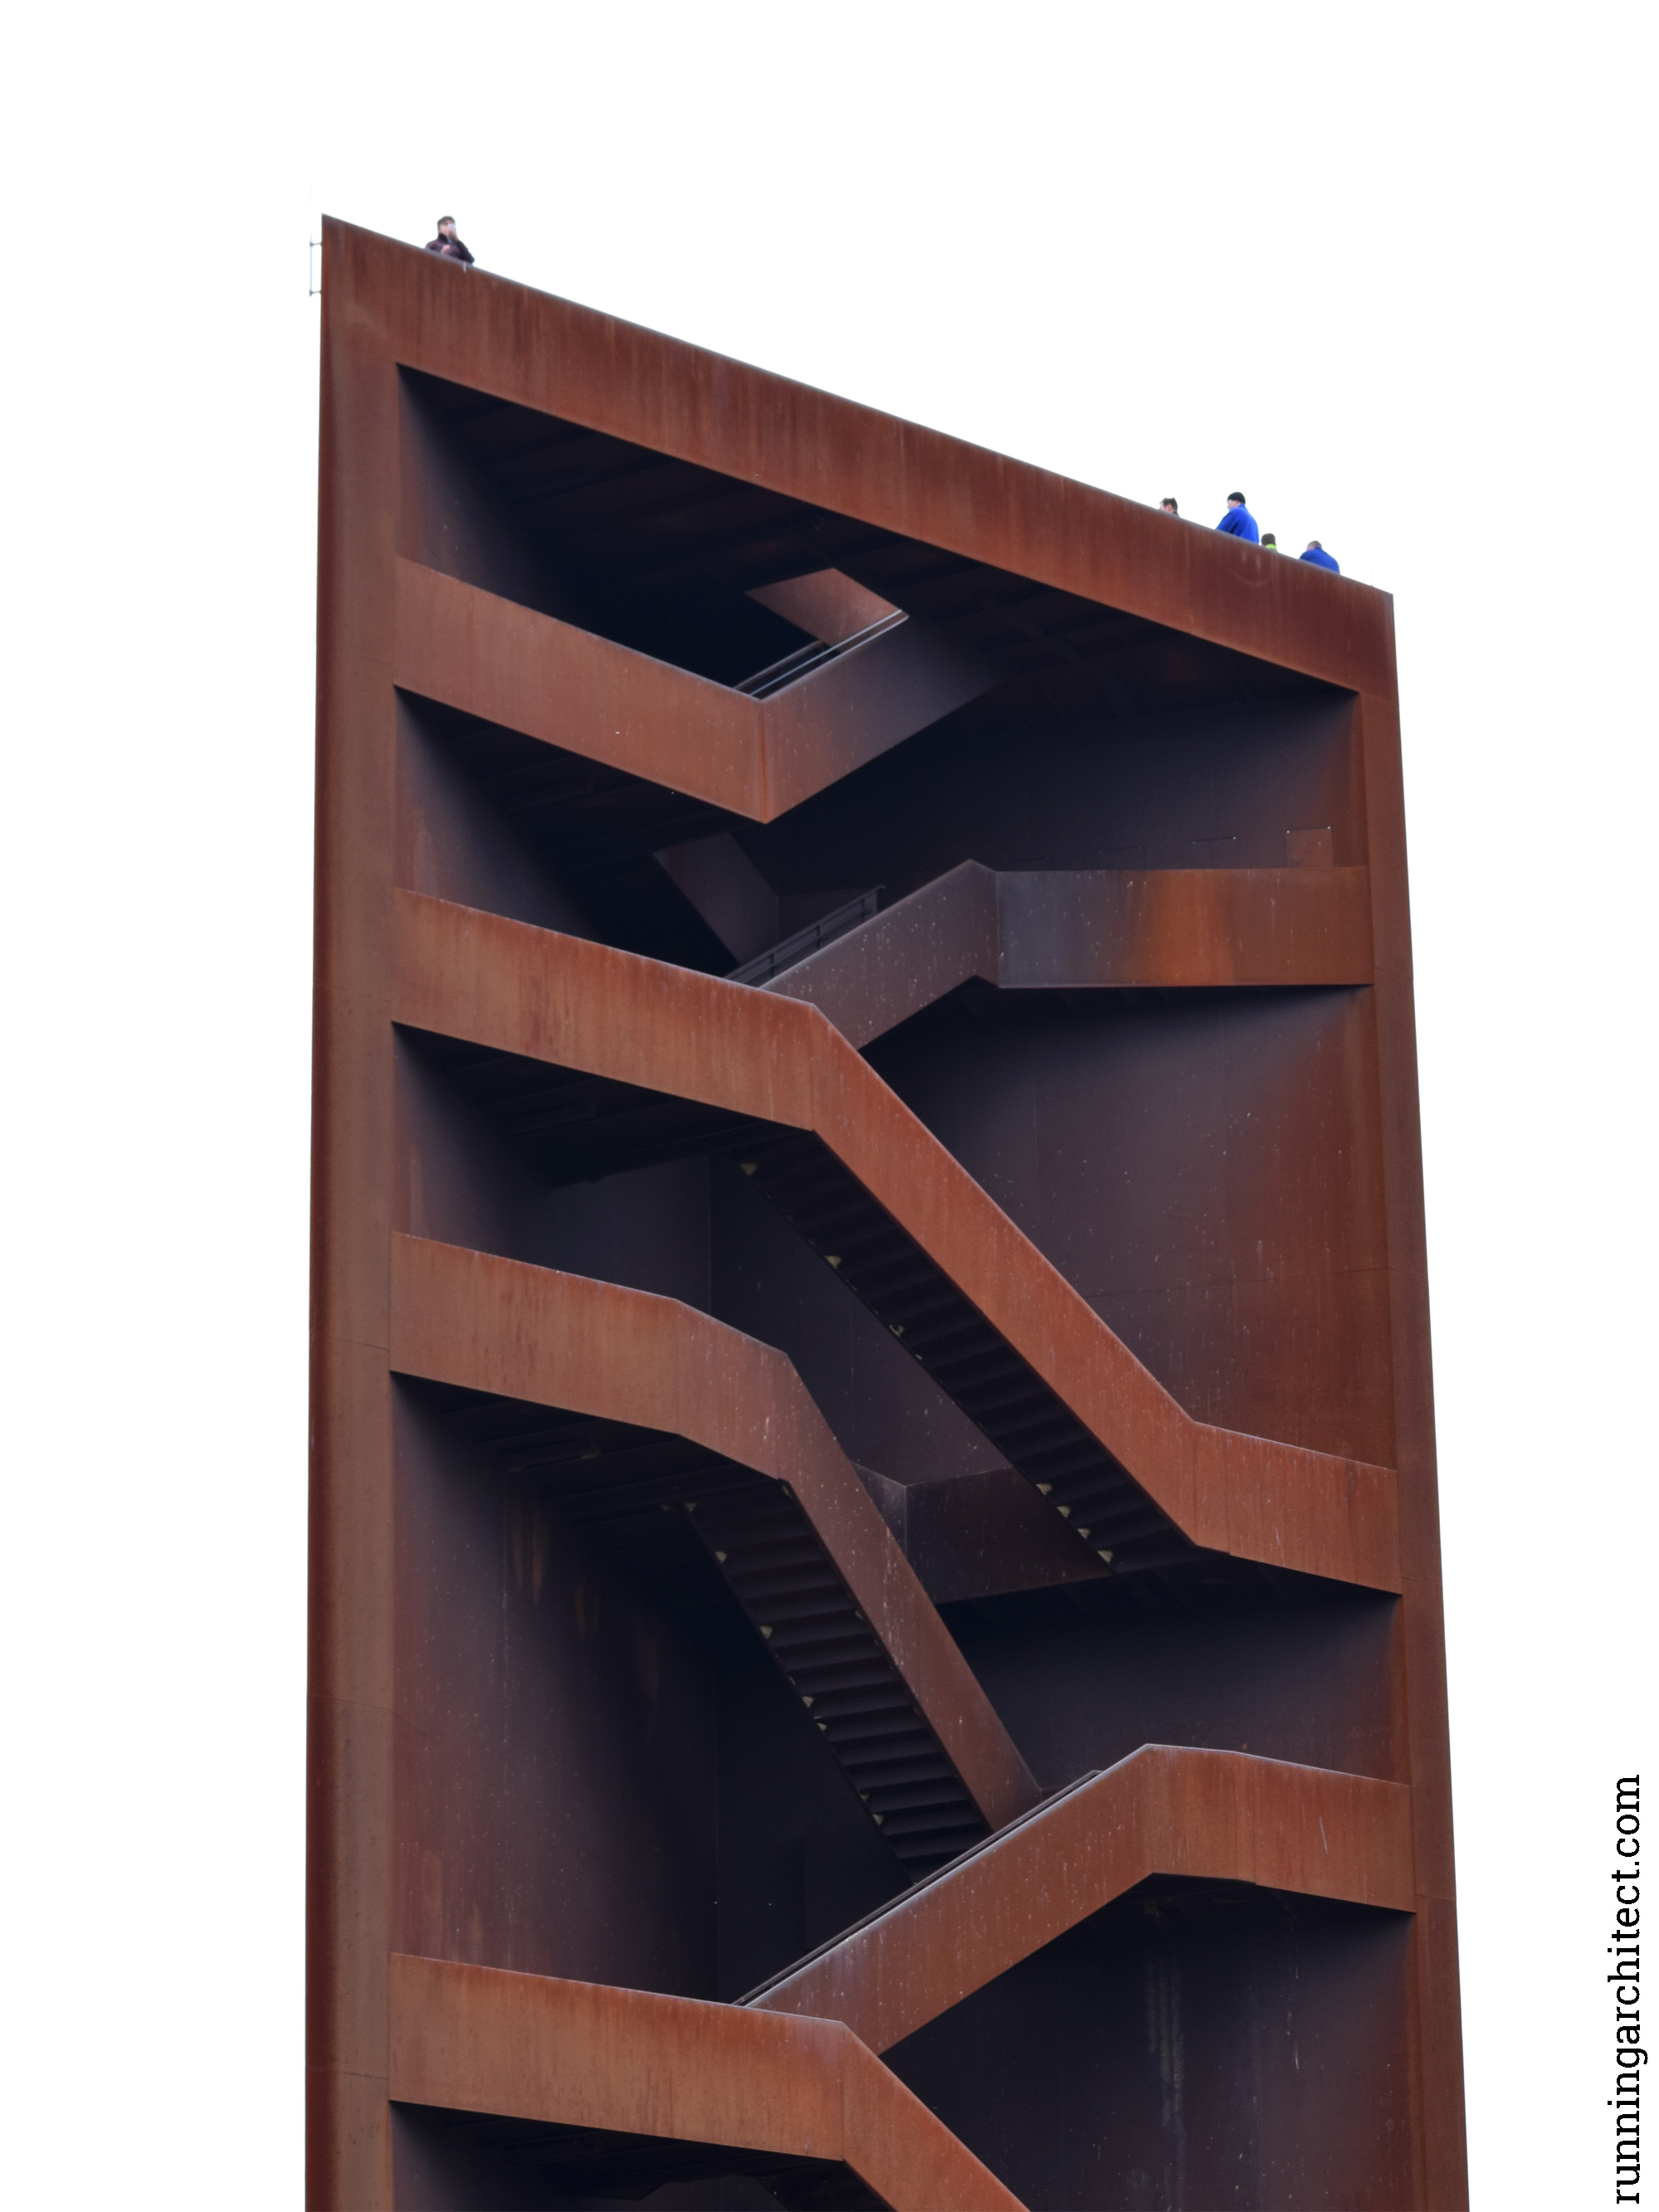 rostiger nagel 01 – running architect.com